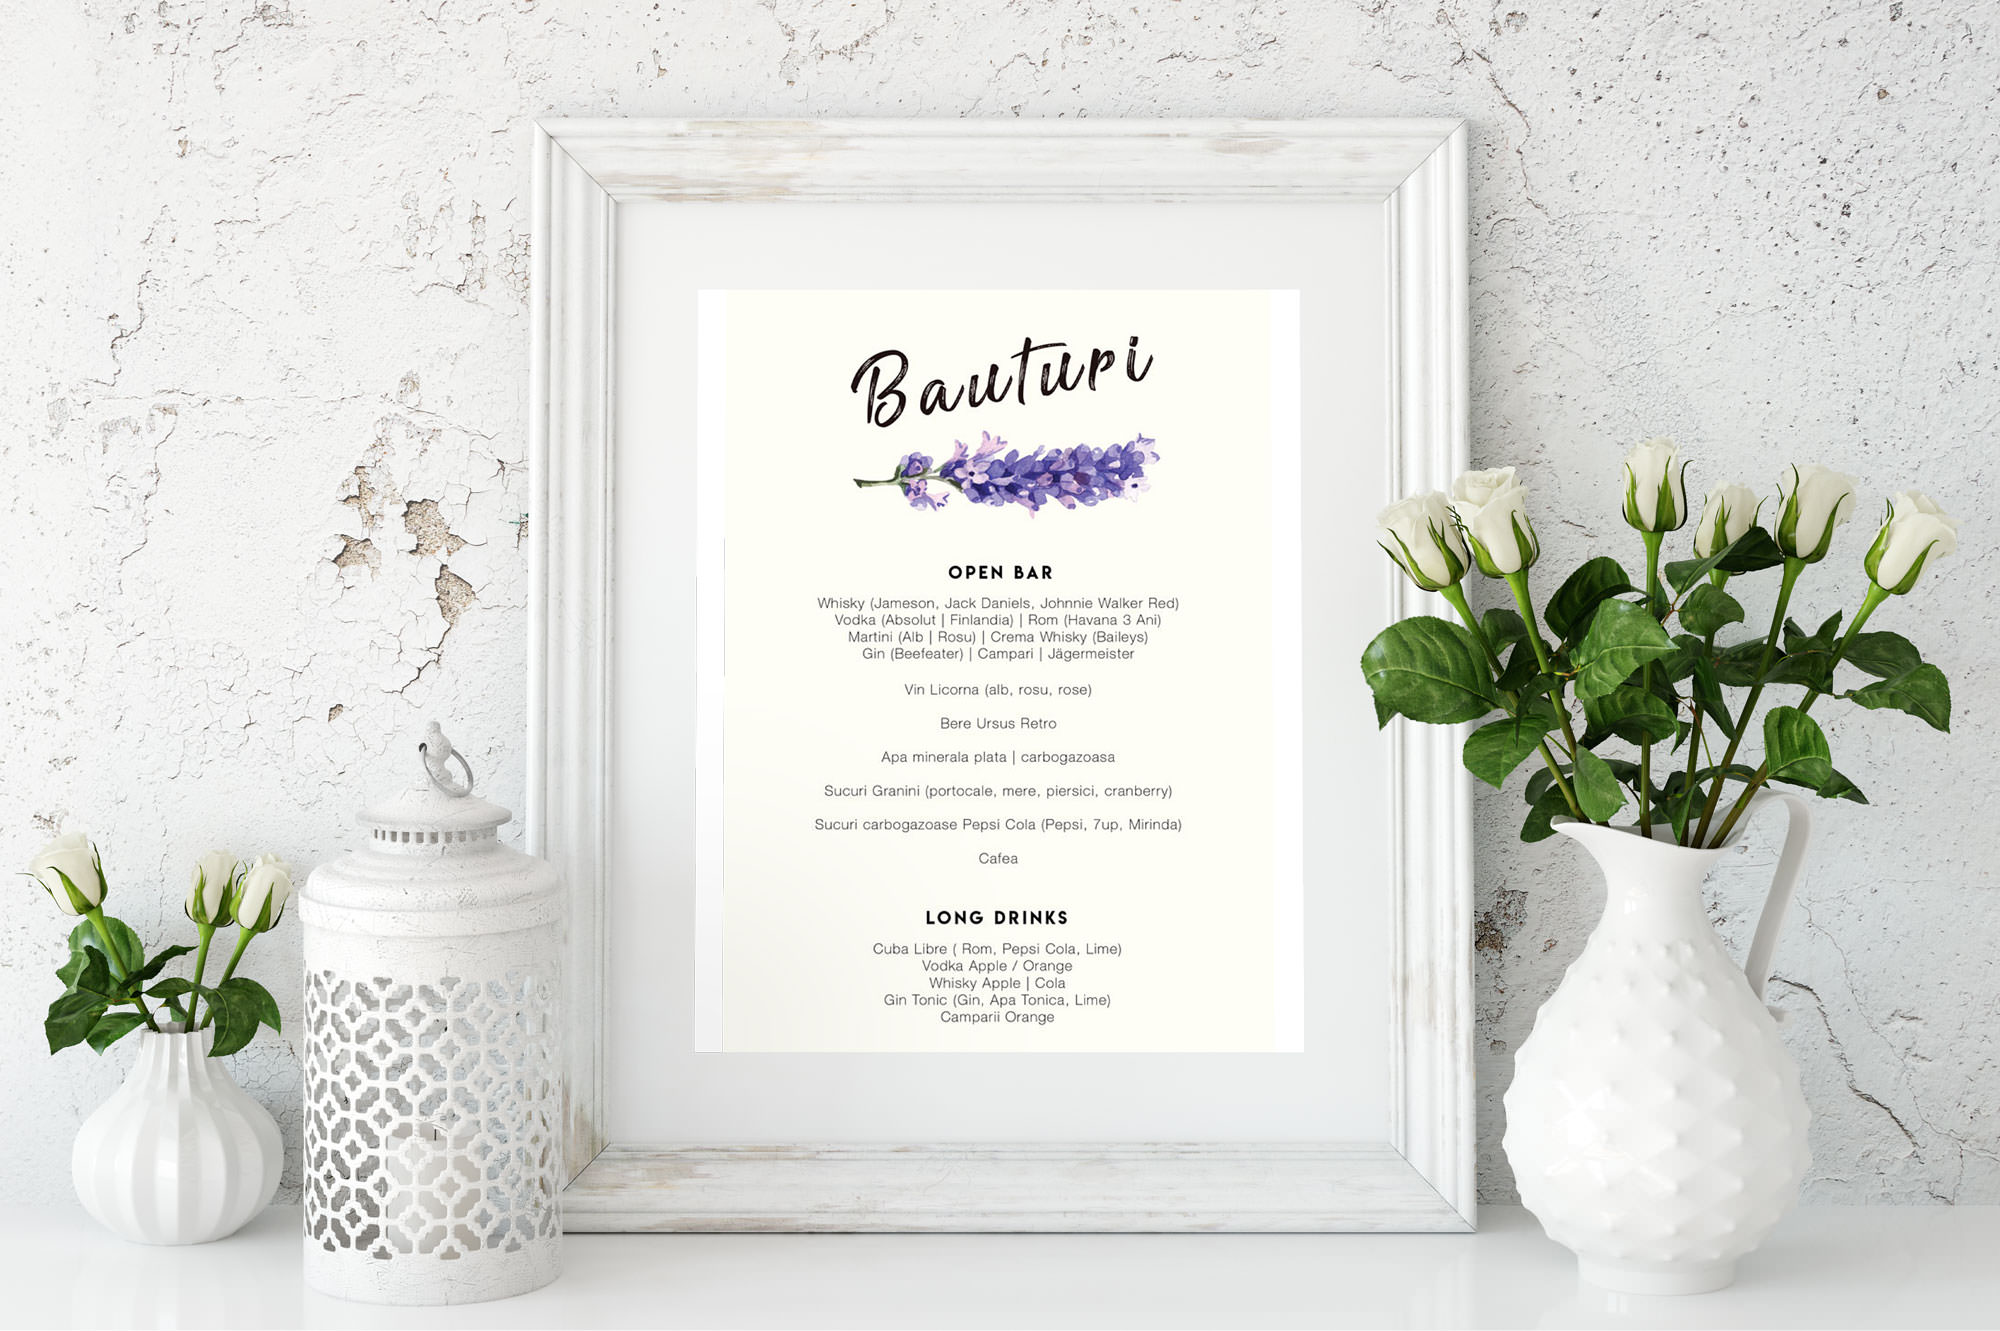 cronica de nunta